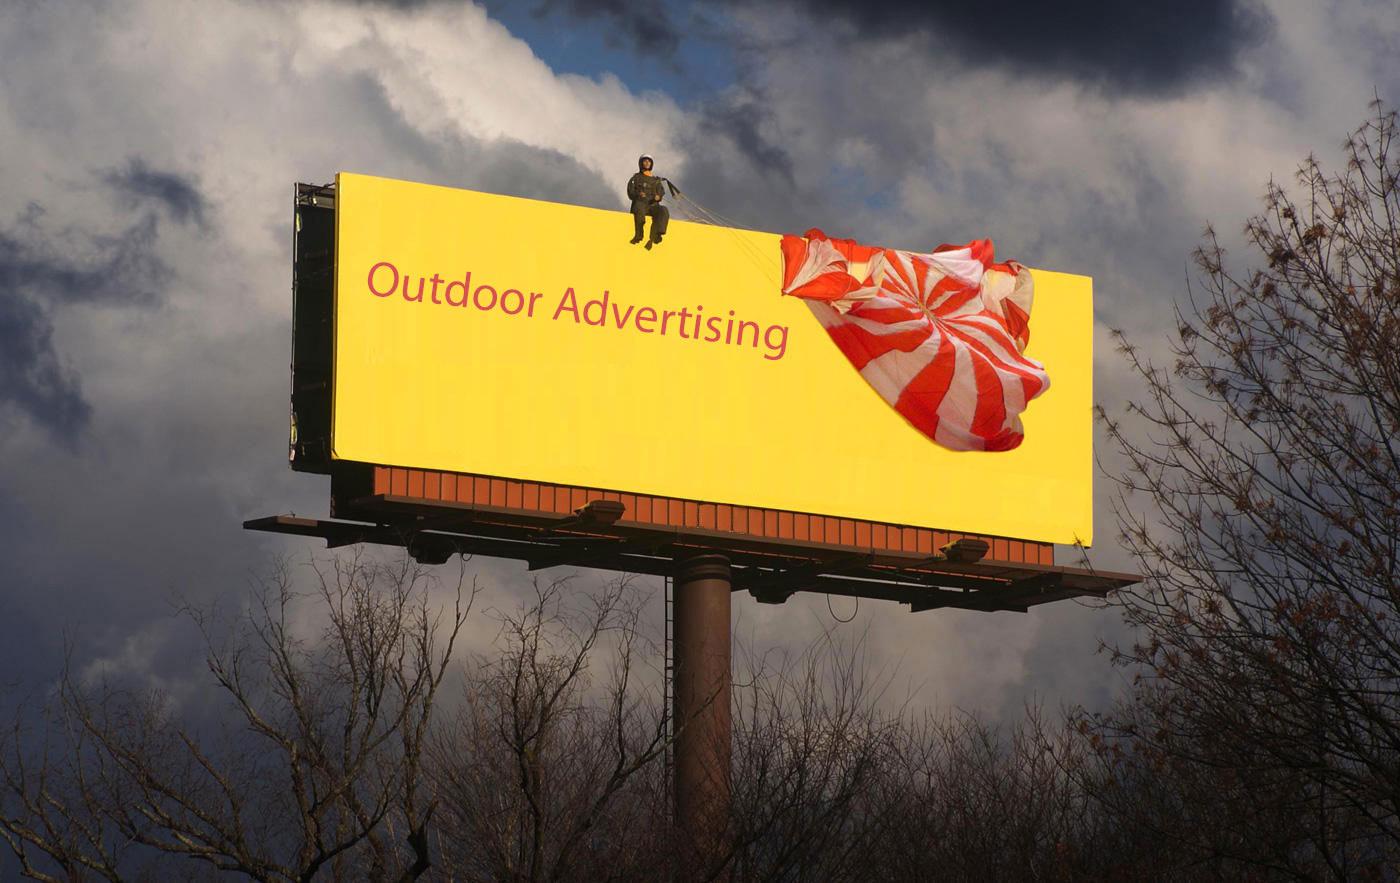 OOH Marketing